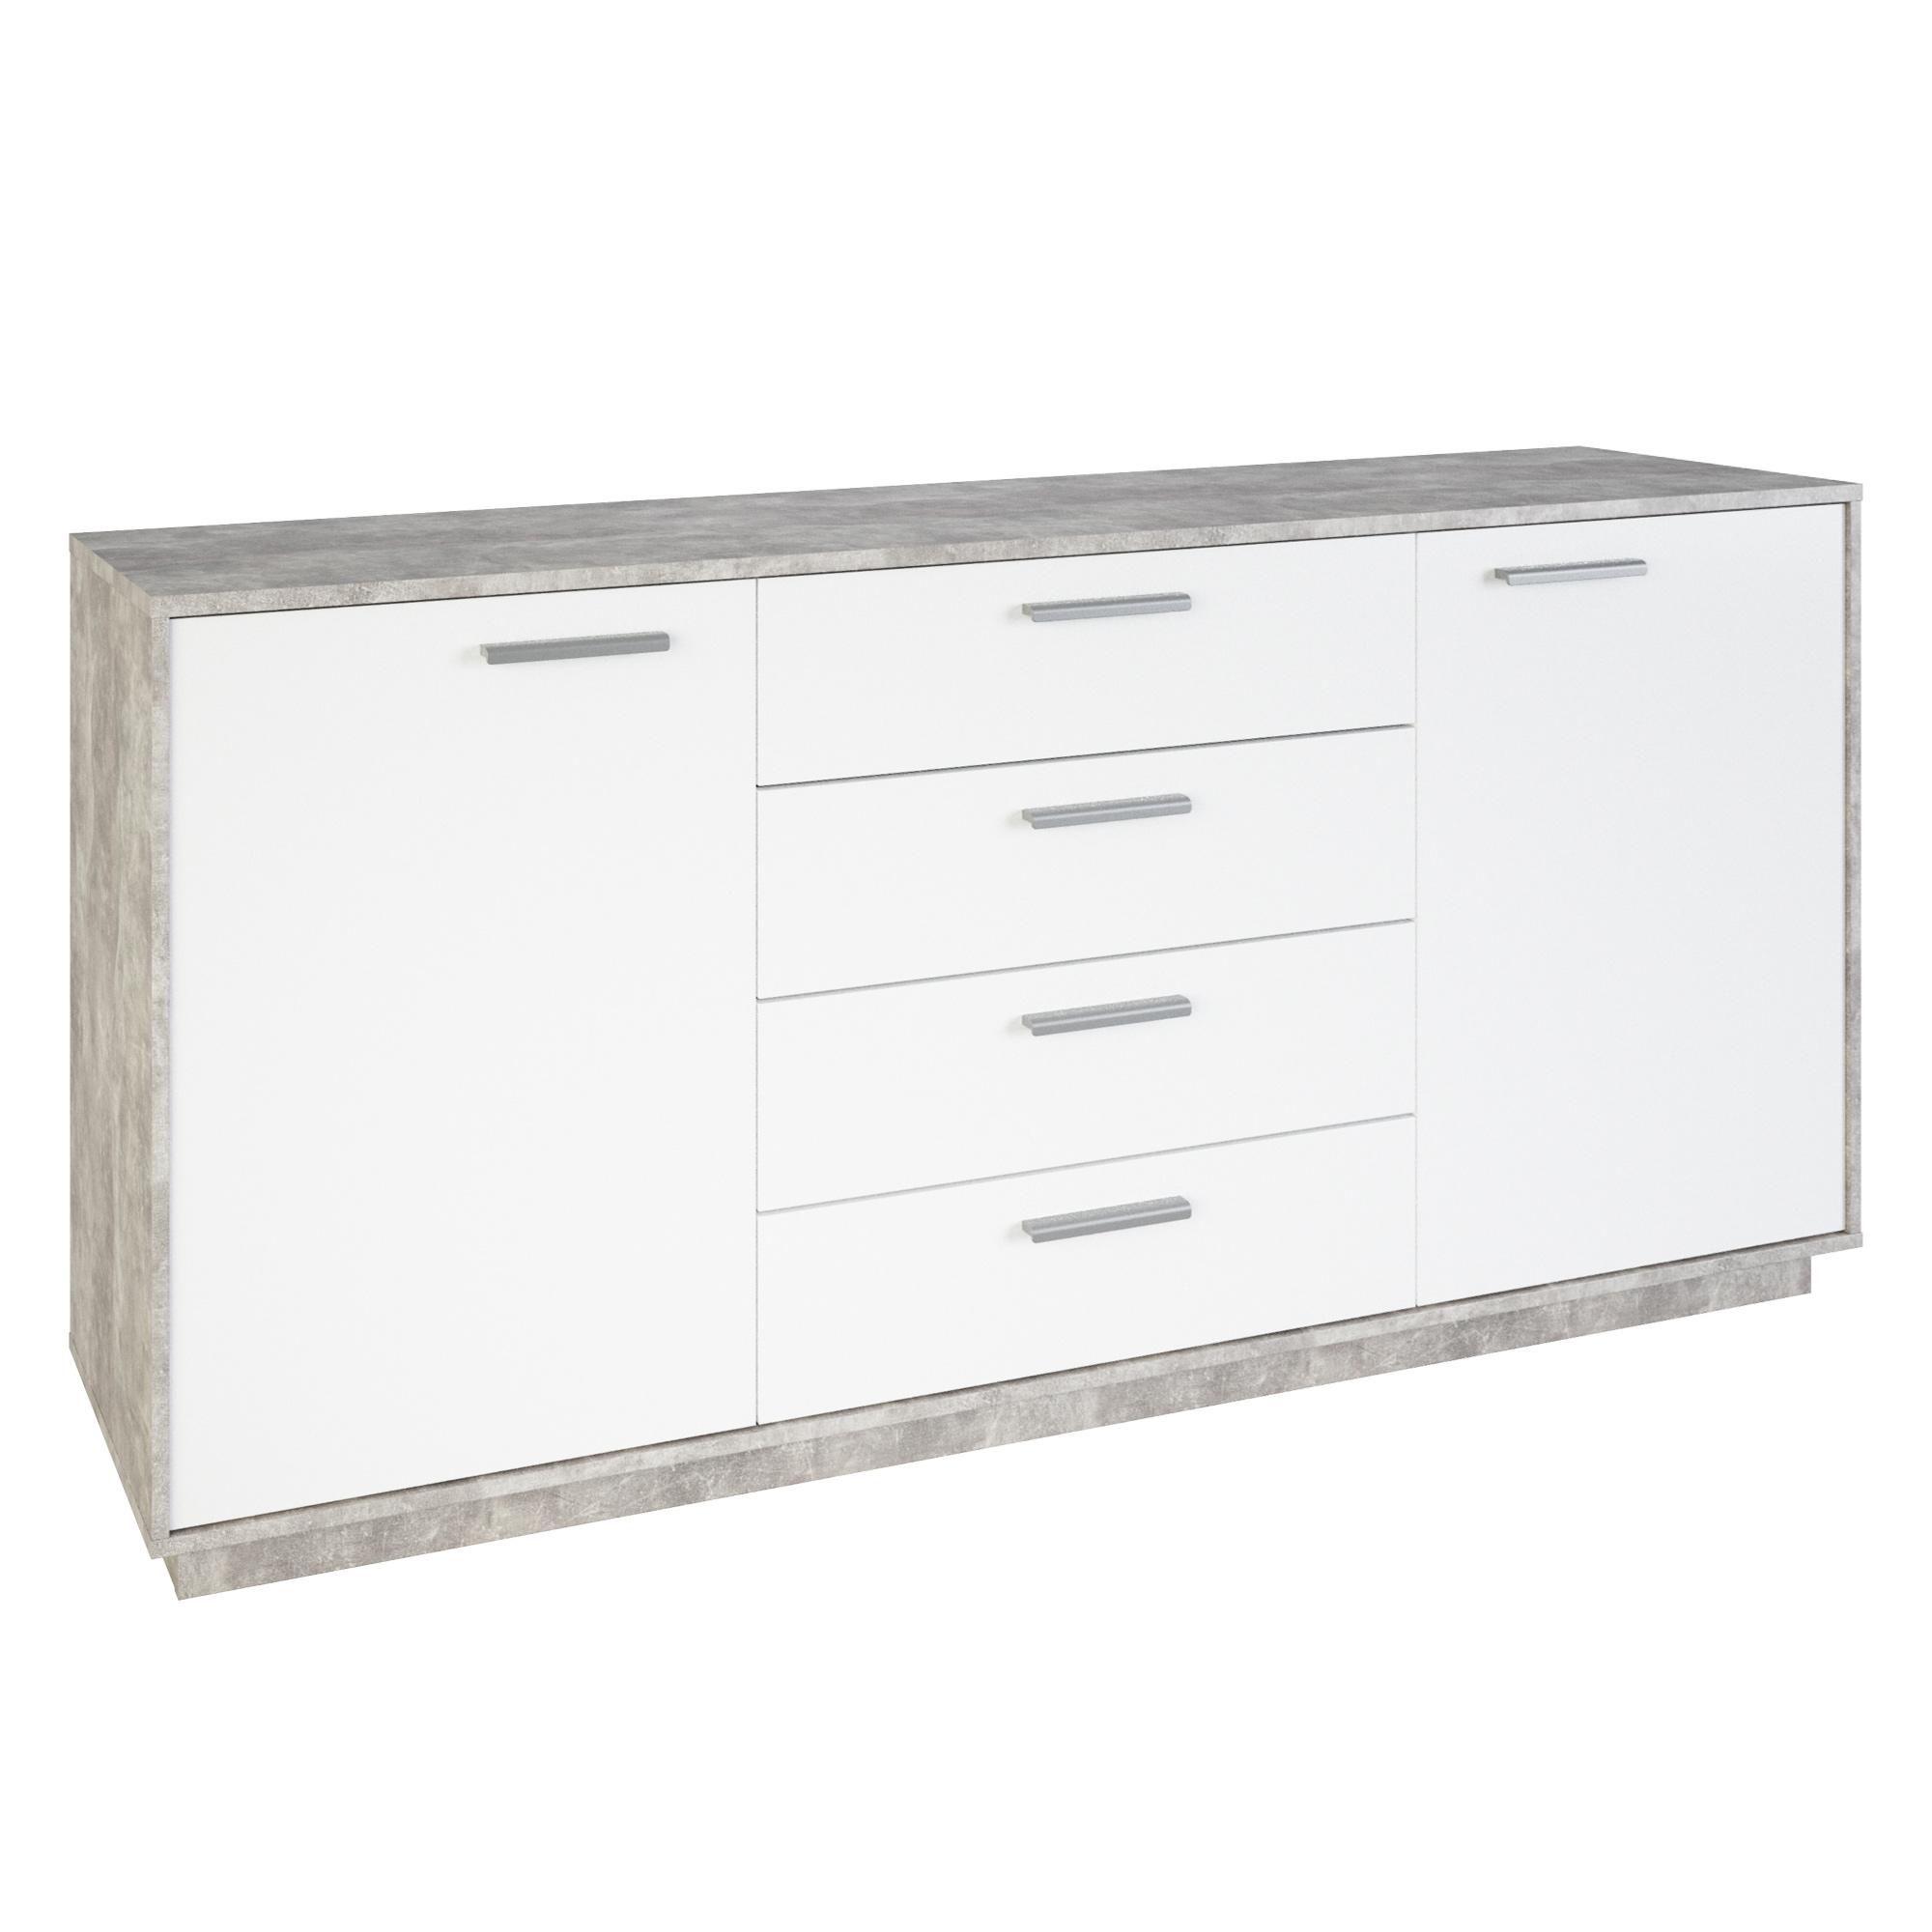 Meuble de rangement contemporain 2 portes/4 tiroirs blanc/béton Sismo II